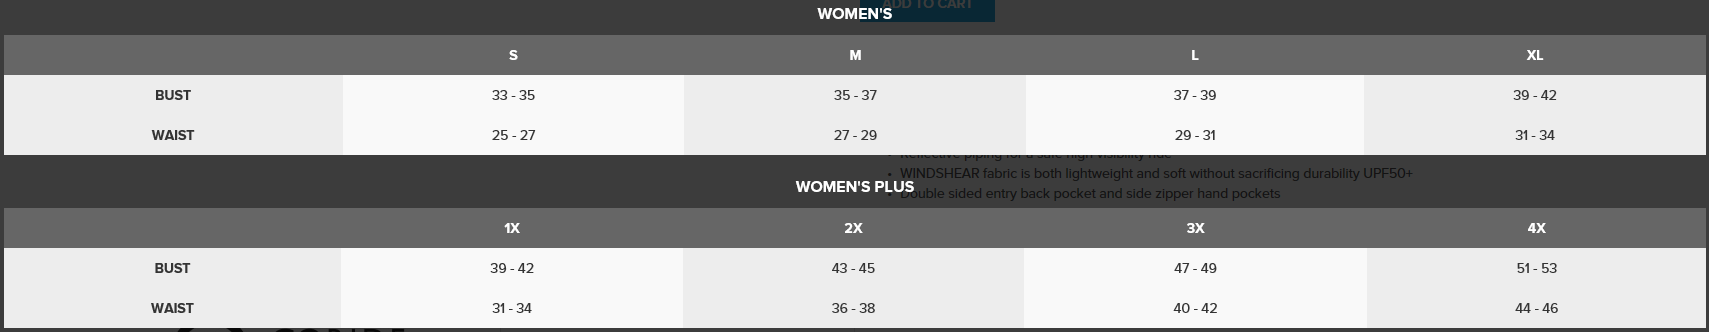 Canari Women's Size Chart 2017